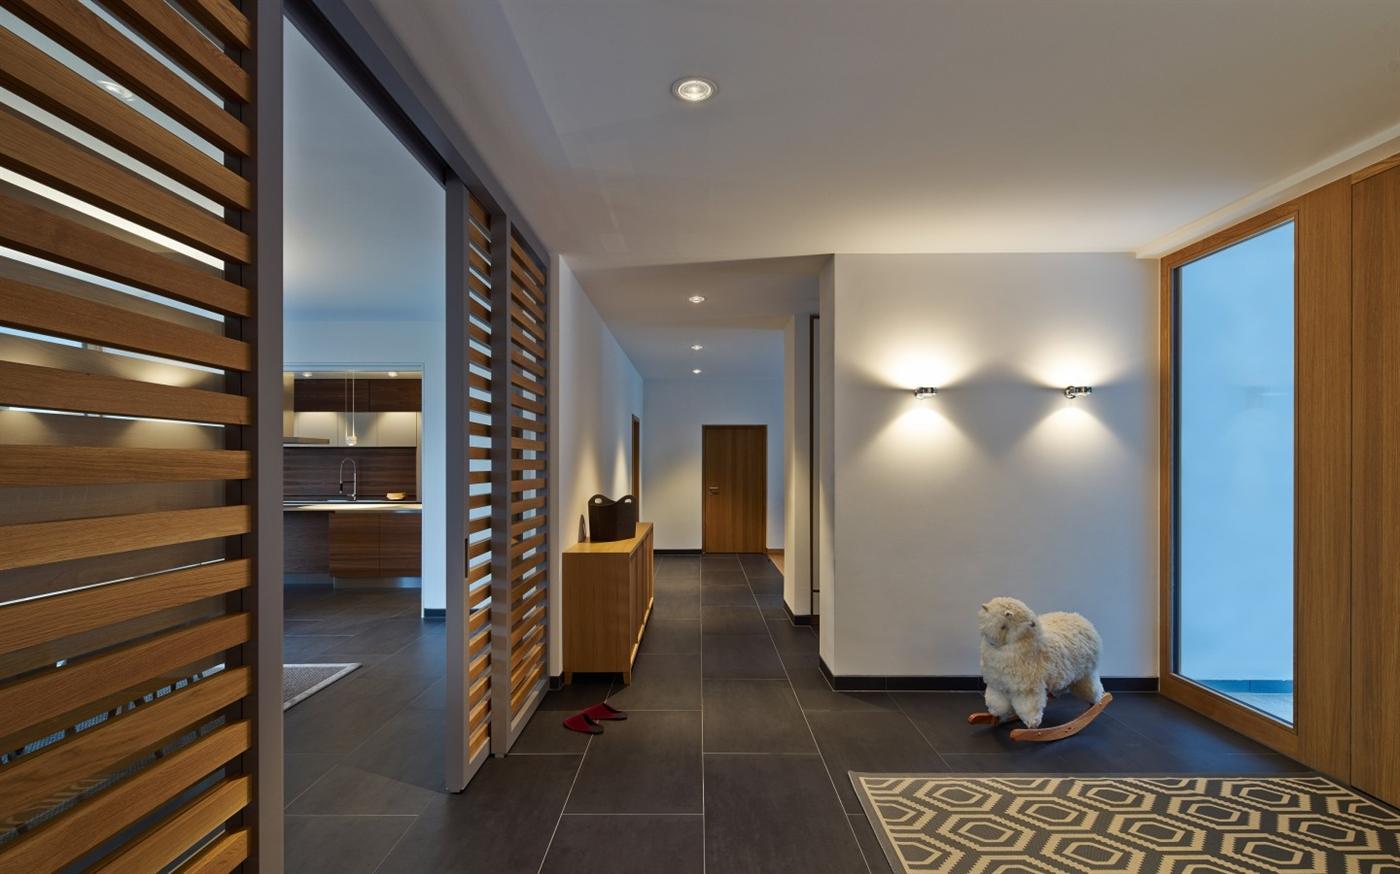 occhio spot af axel meise k b occhio sento d v gspots. Black Bedroom Furniture Sets. Home Design Ideas